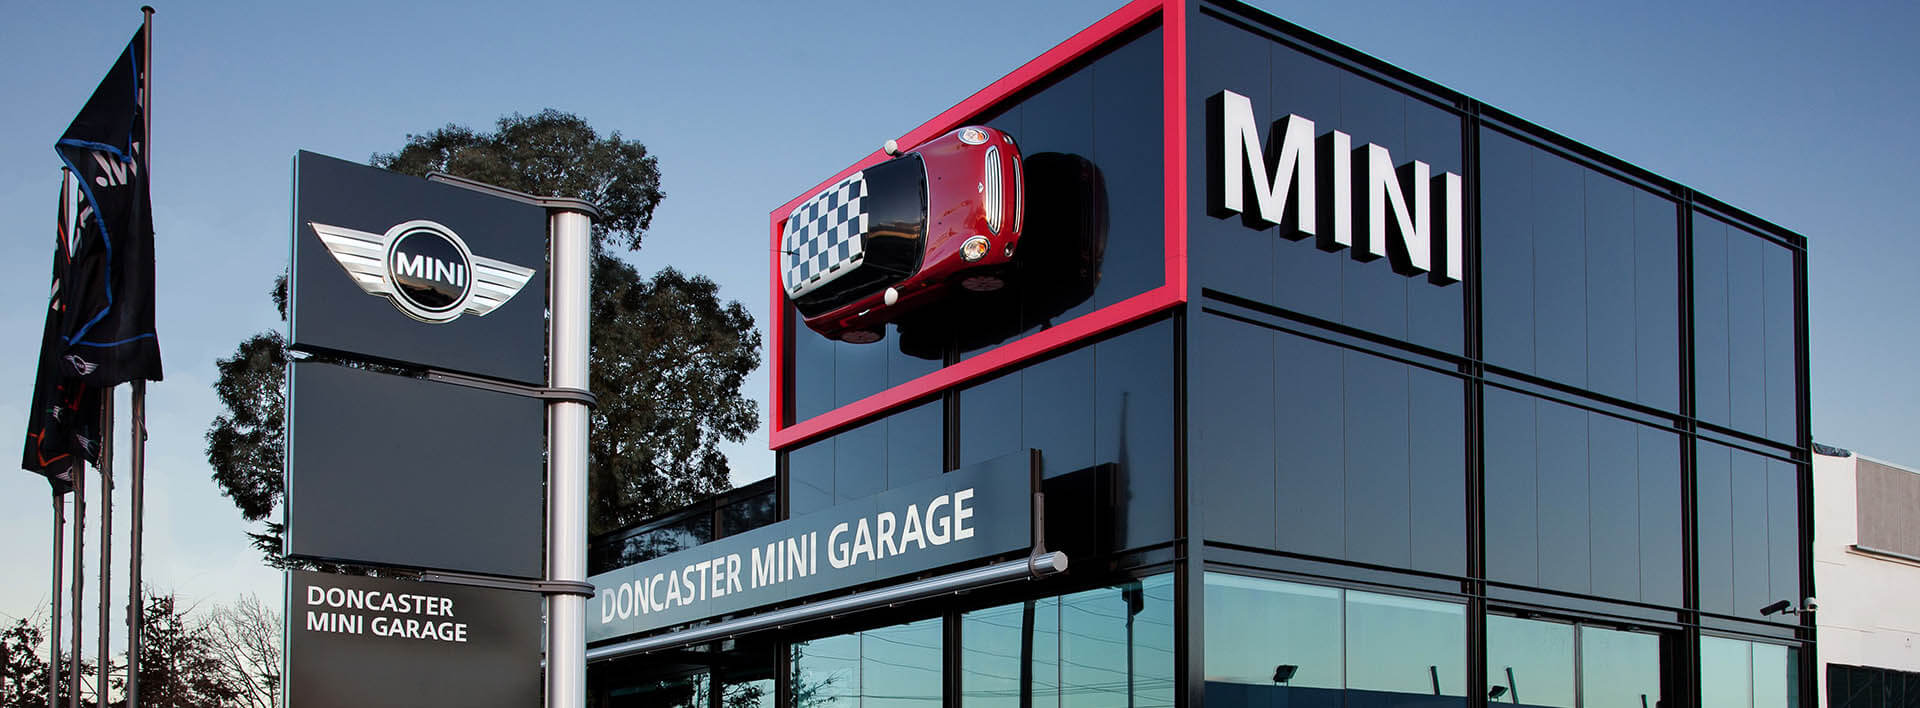 Doncaster MINI Garage Melbourne